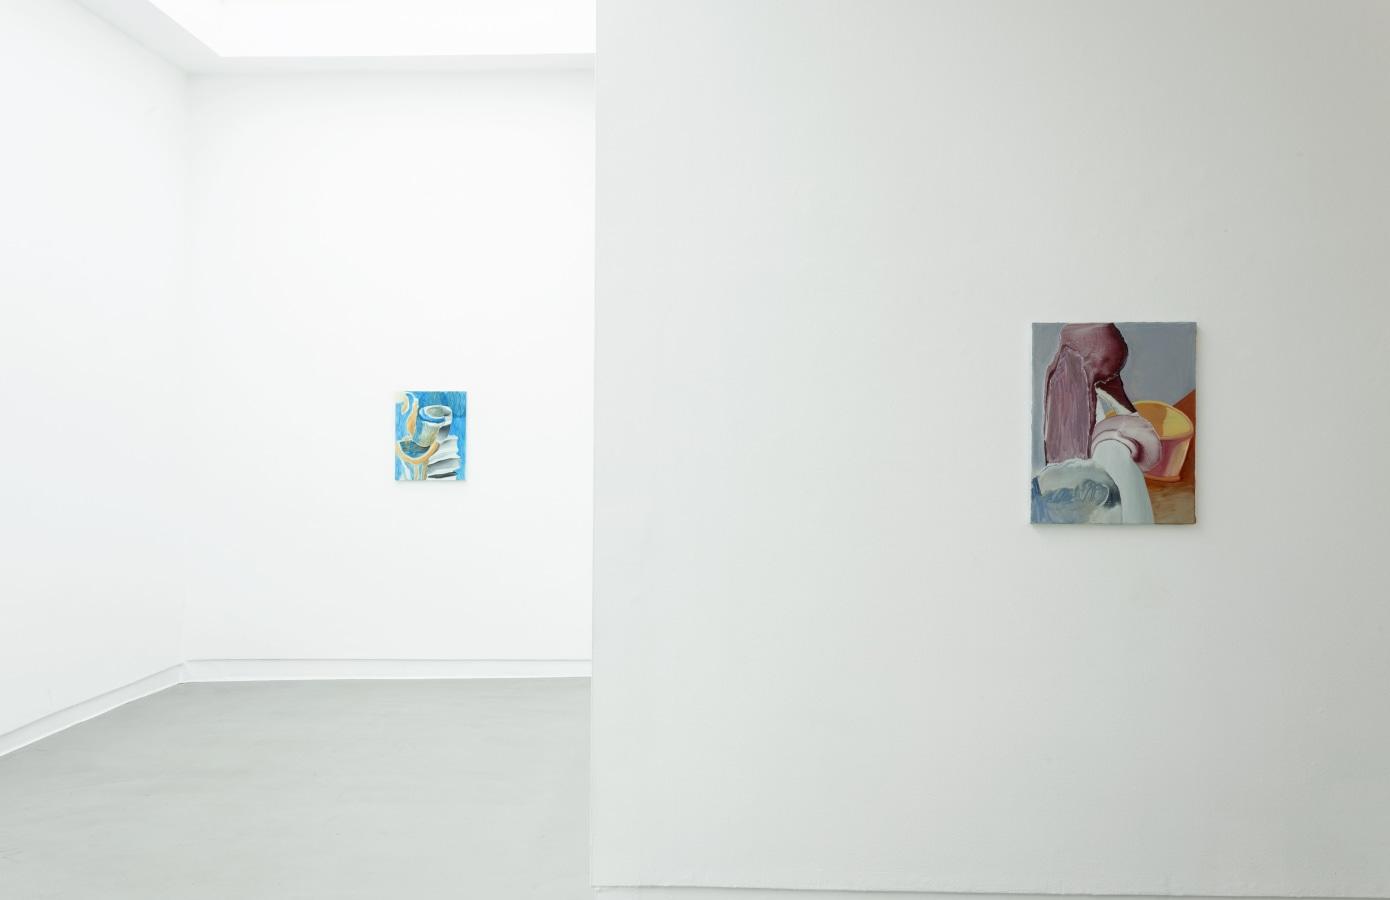 Drifting Constants, Rezi van Lankveld,